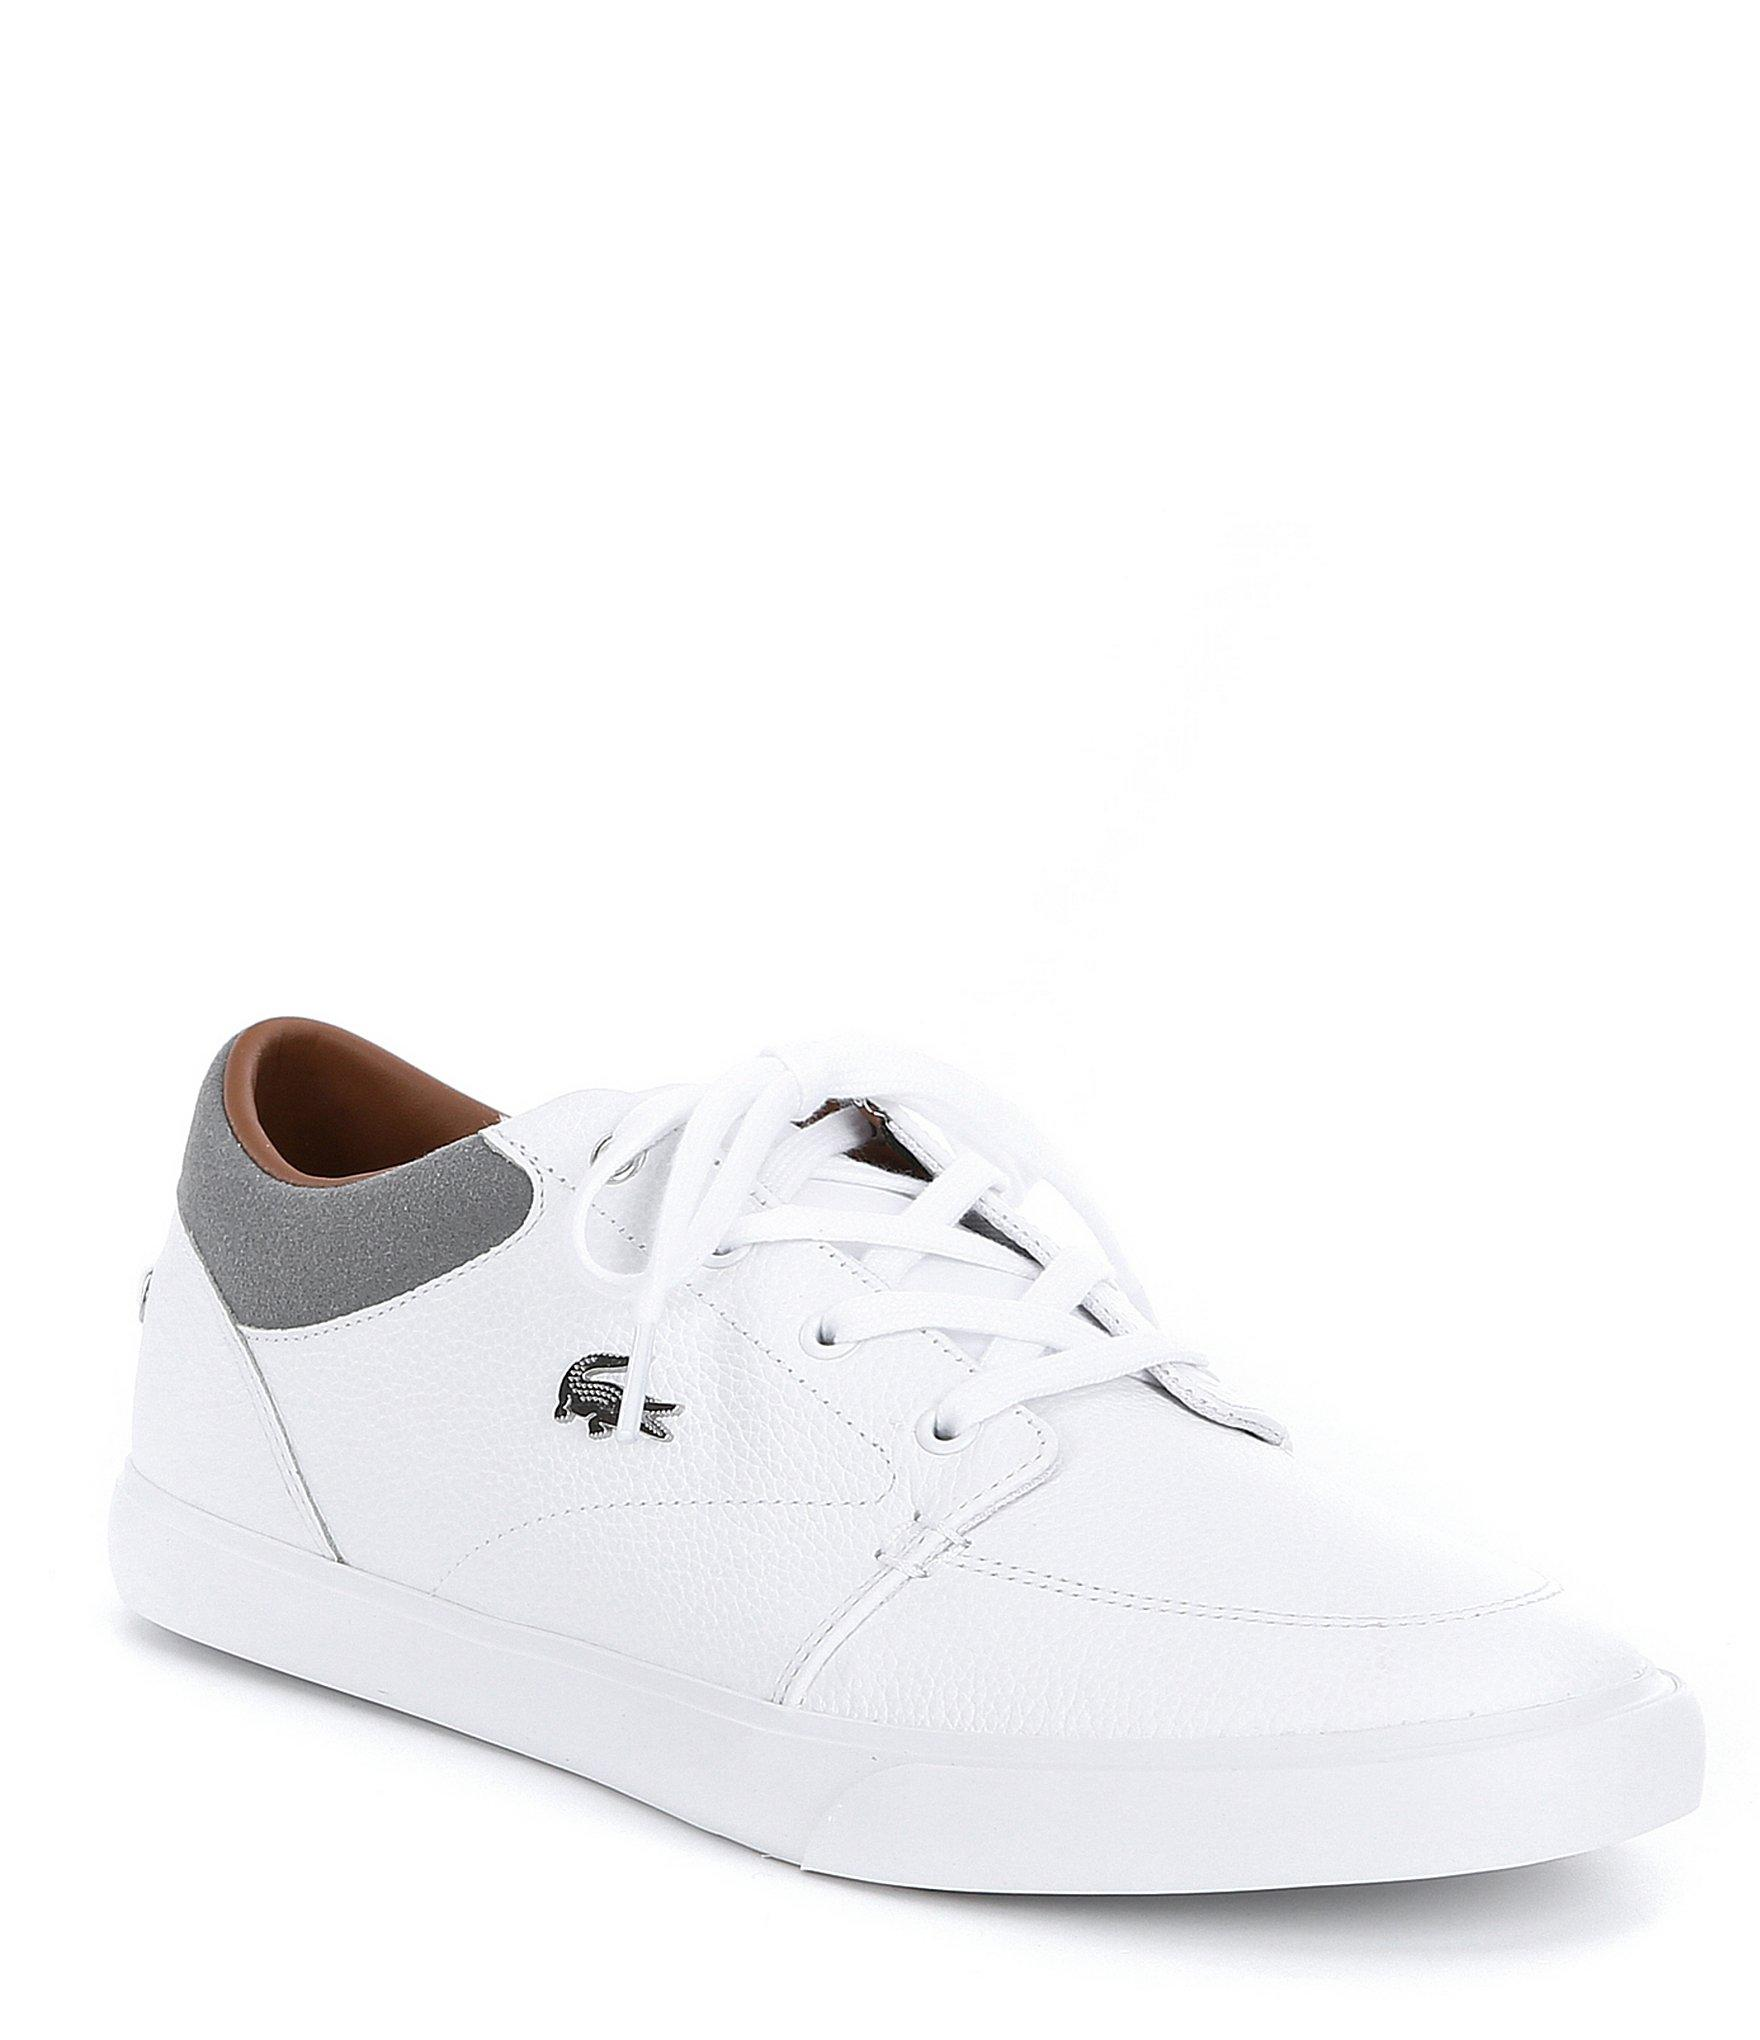 aab099b0c Lacoste - Gray Men s Bayliss 118 Sneakers for Men - Lyst. View fullscreen